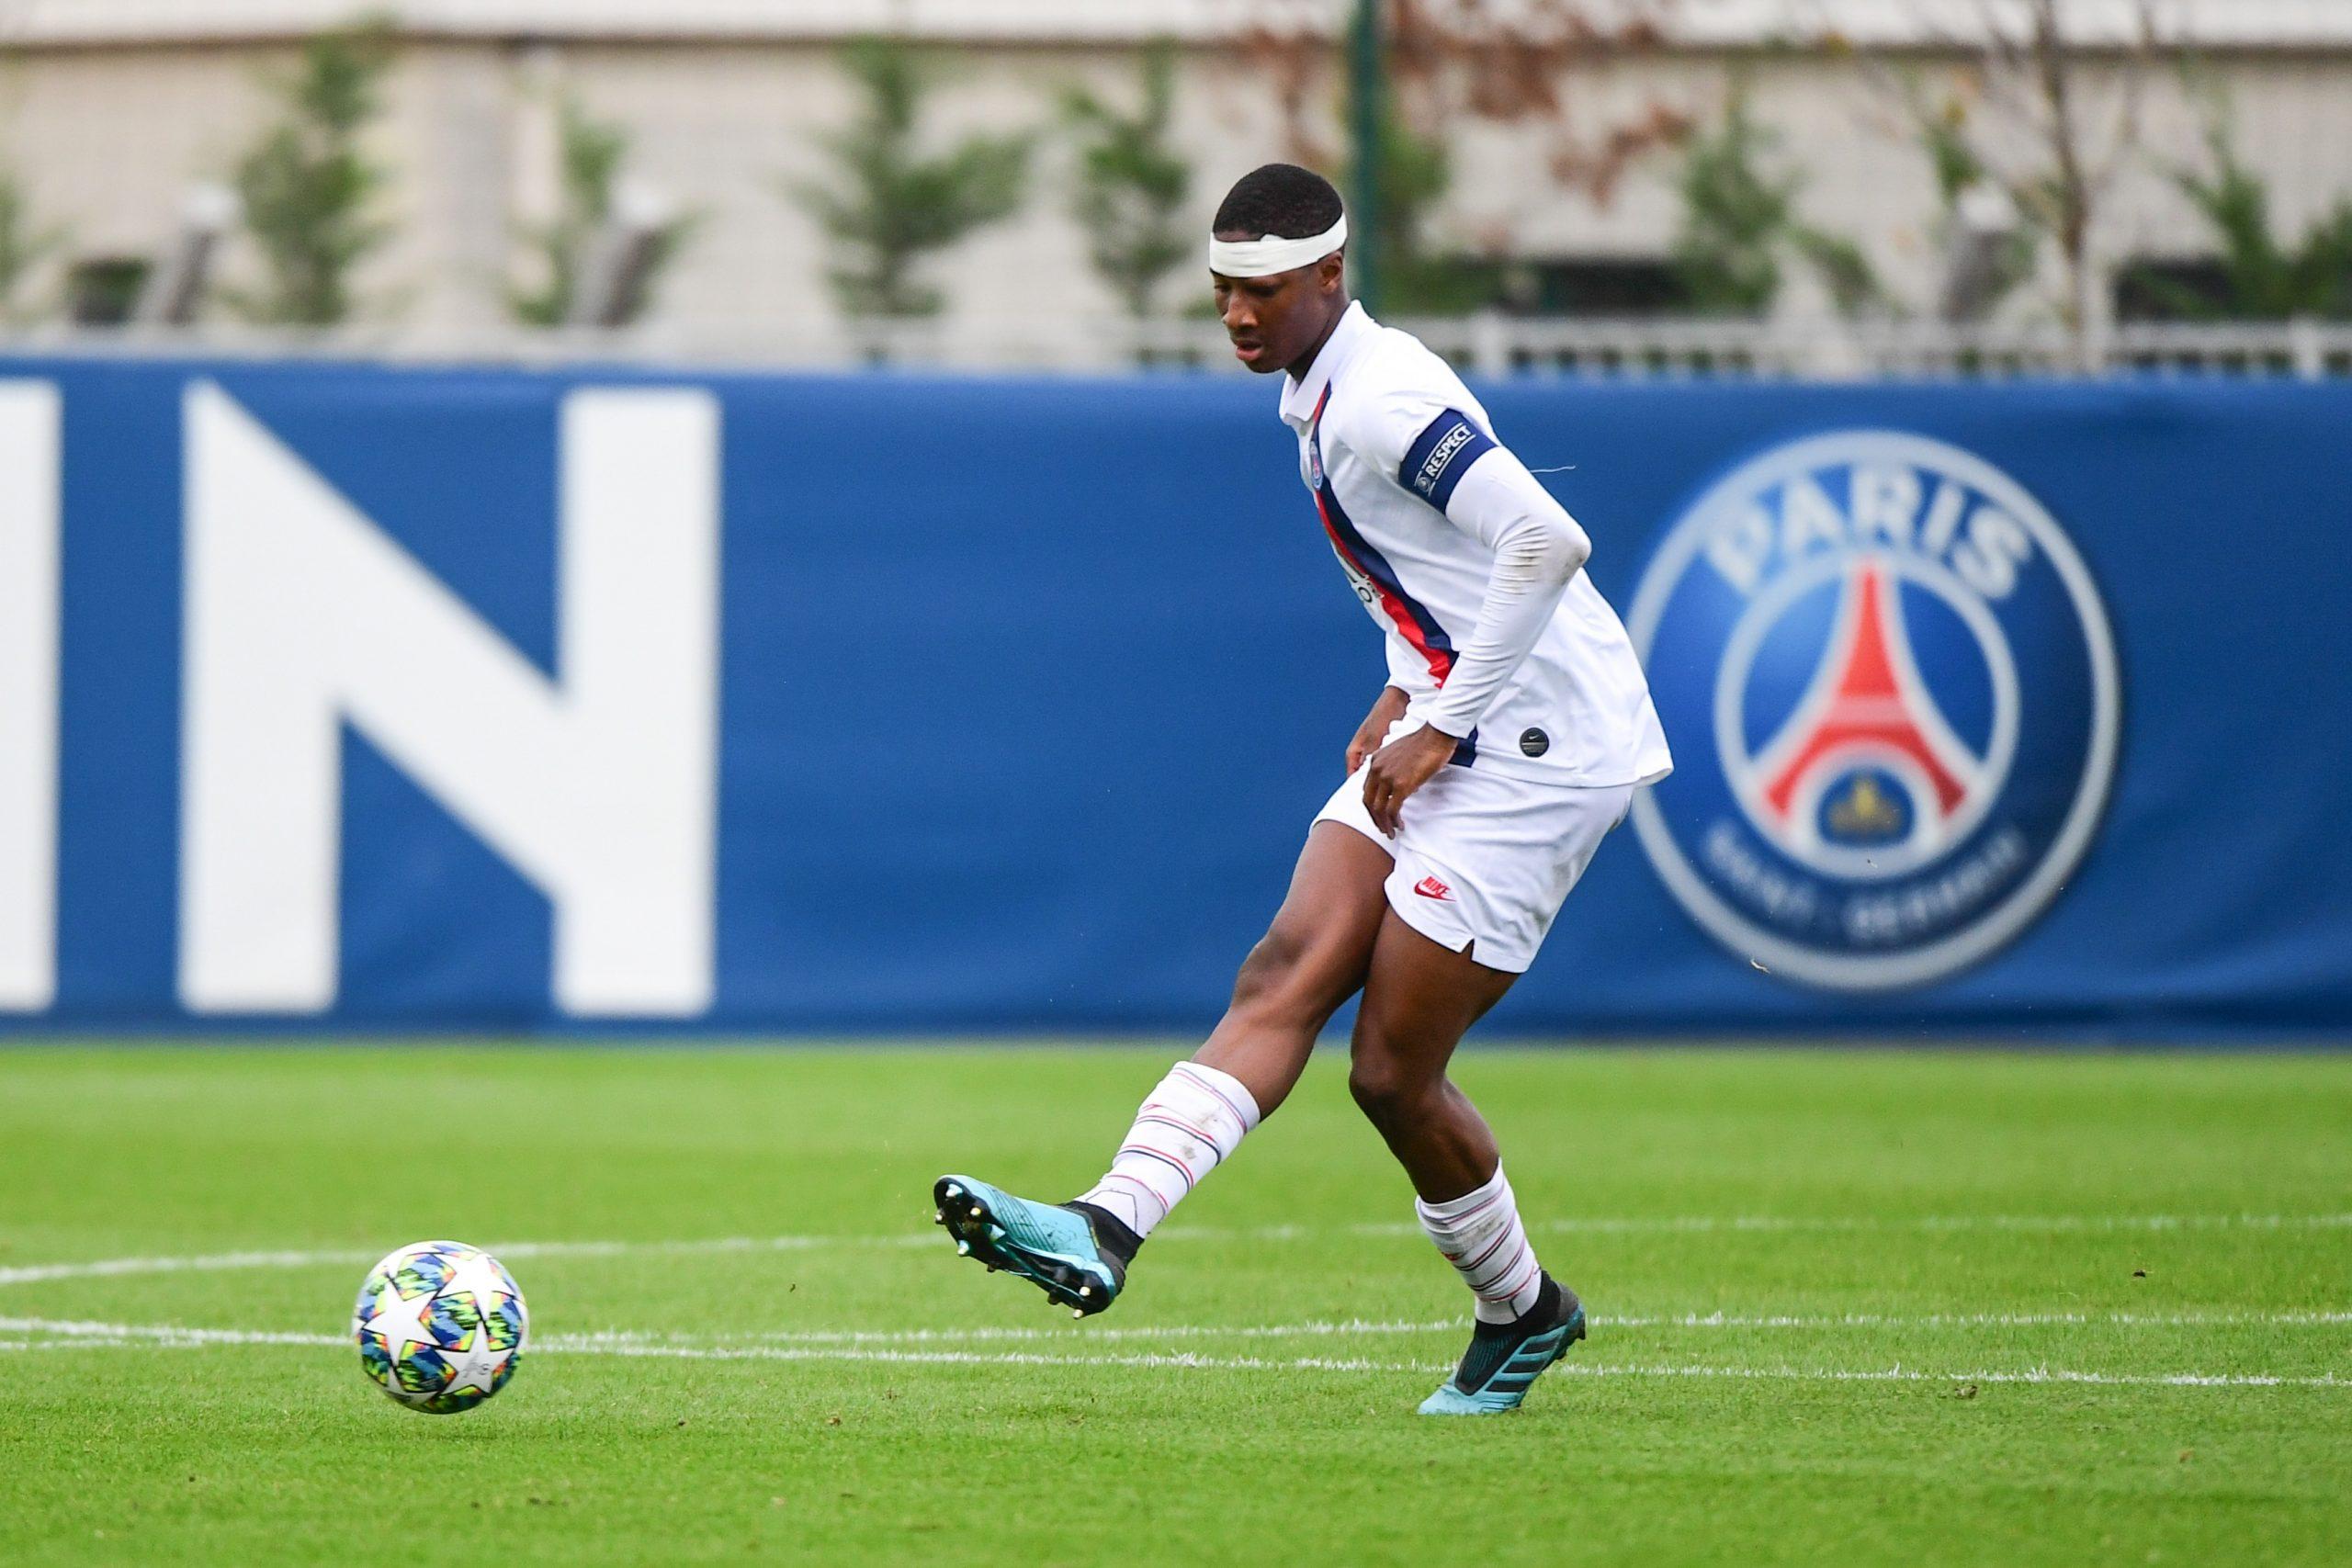 Mercato - Le Standard de Liège va garder Moussa Sissako, confirme RMC Sport